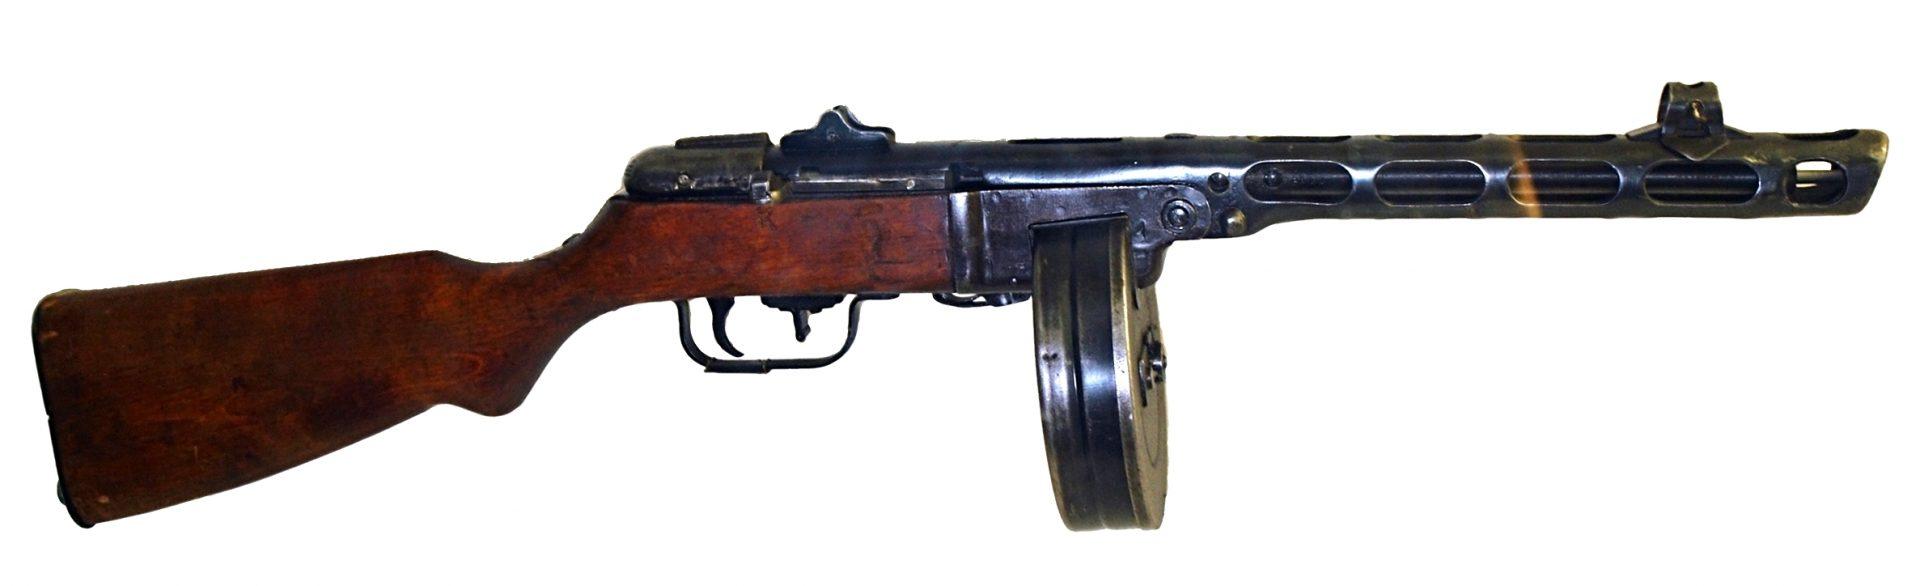 Пистолет-пулемет_системы_Шпагина_обр__1941